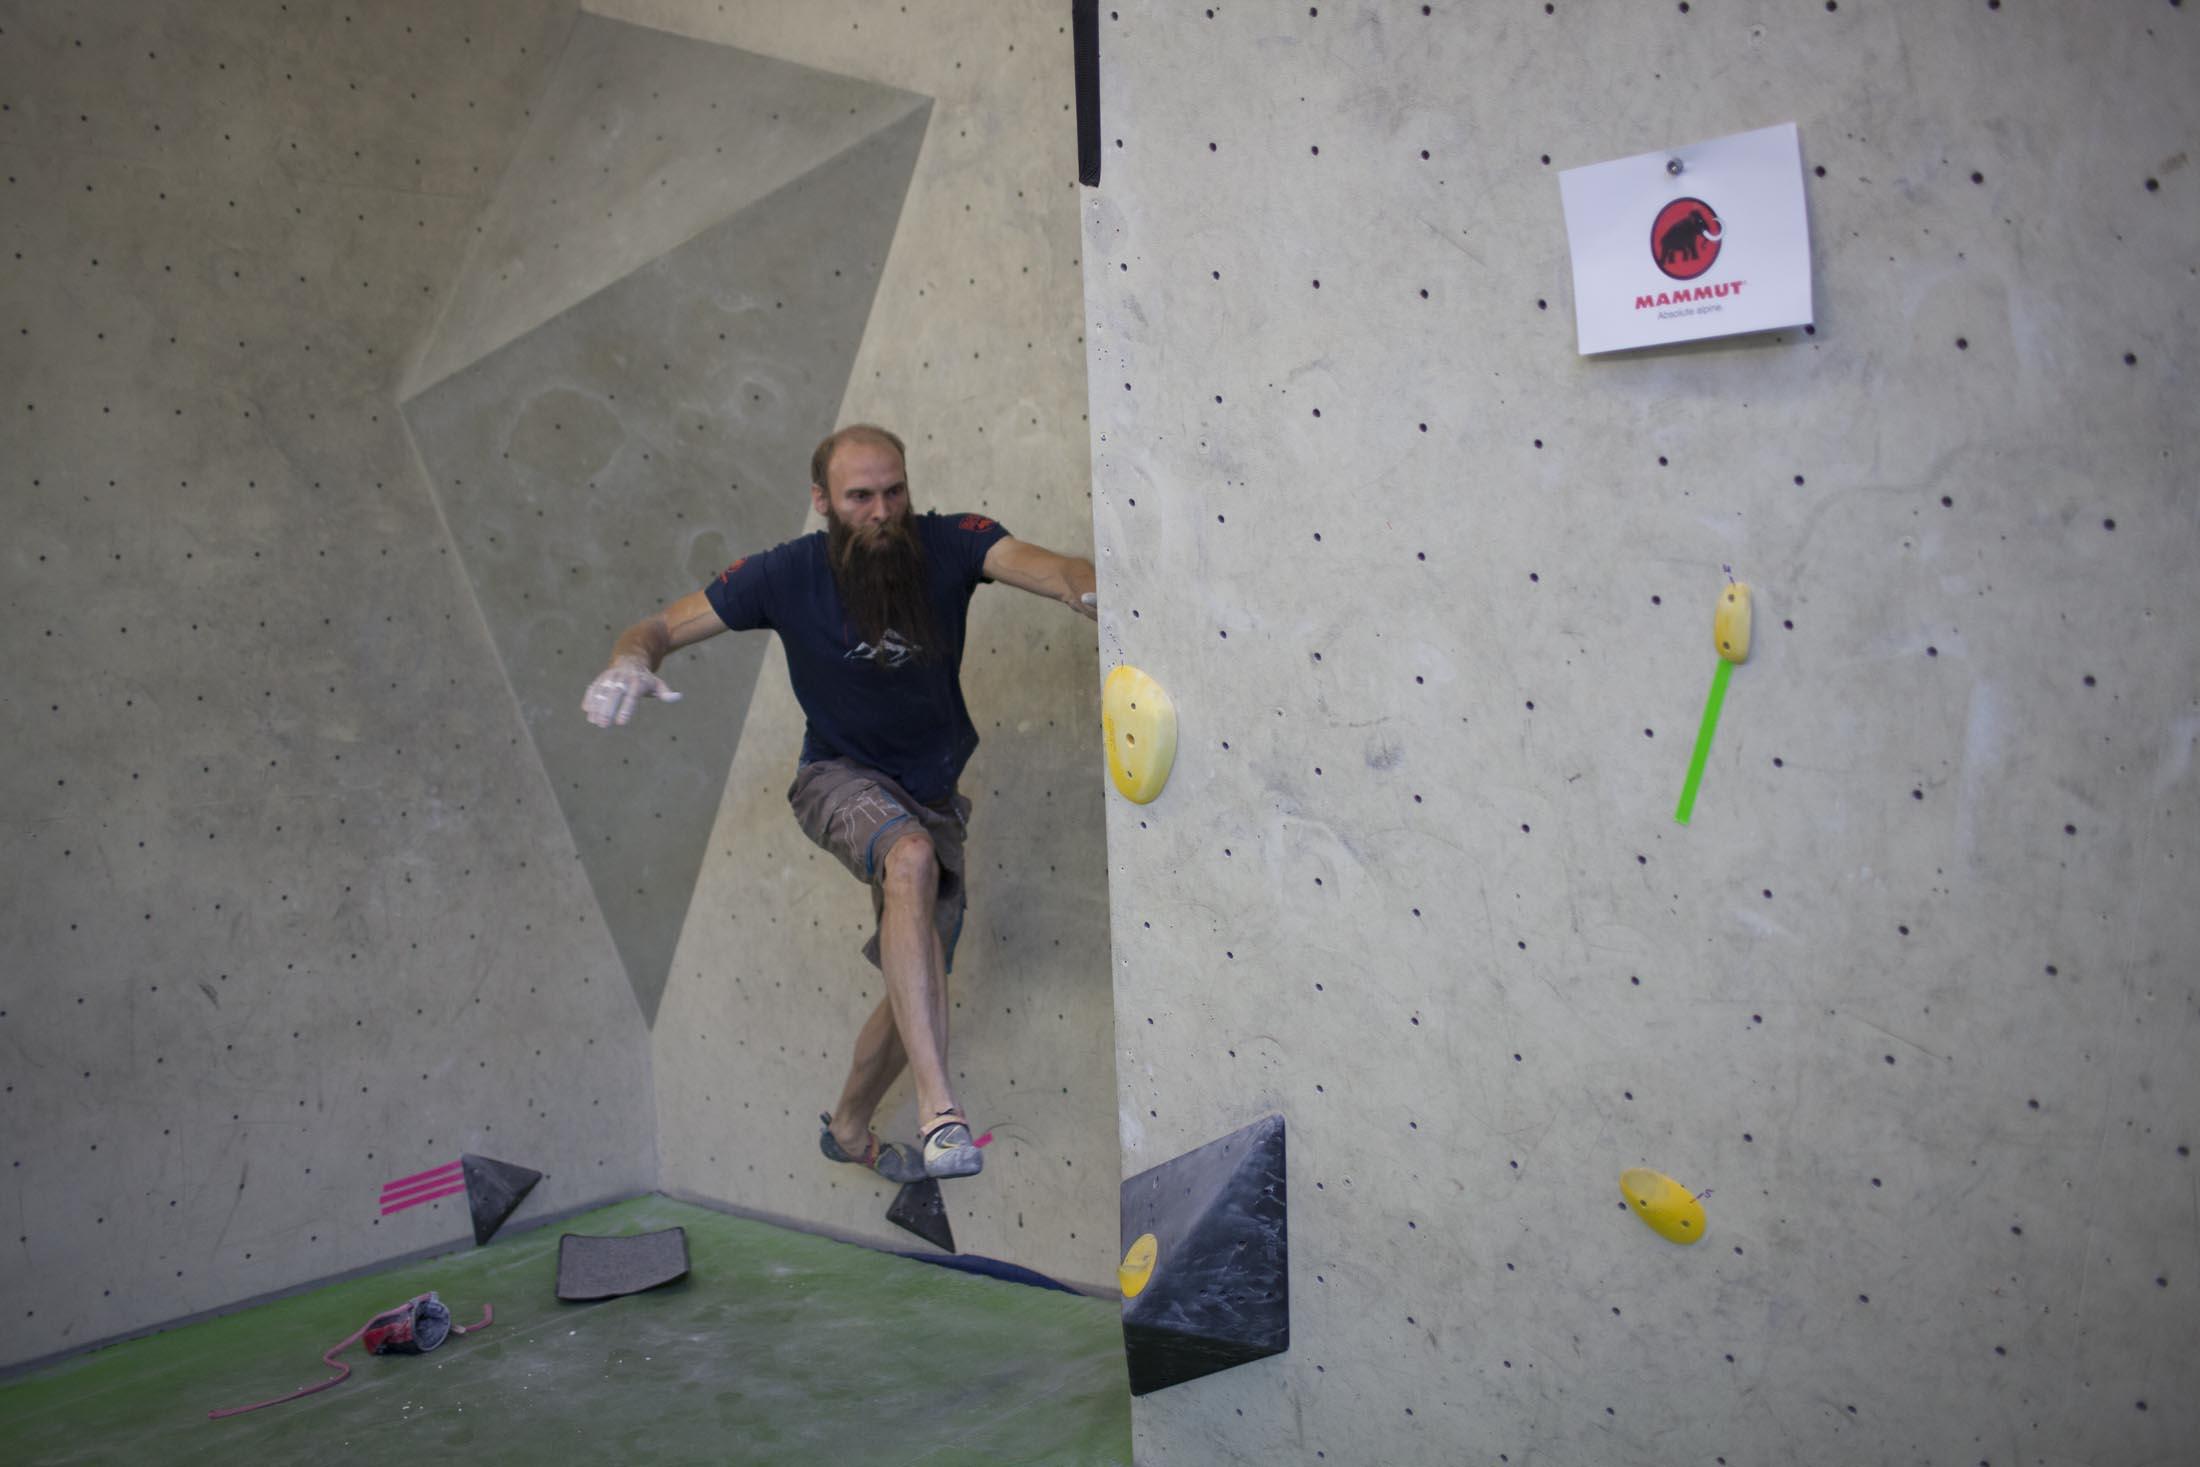 Finale, internationaler bouldercup Frankenjura 2016, BLOCKHELDEN Erlangen, Mammut, Bergfreunde.de, Boulderwettkampf07092016486